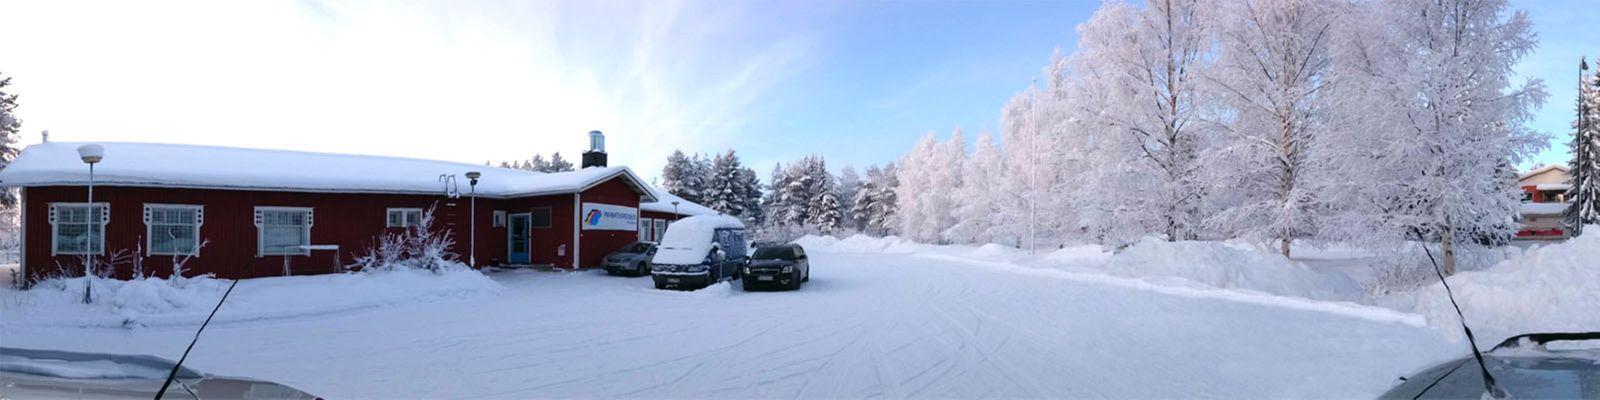 Painatuskeskus Rovaniemi